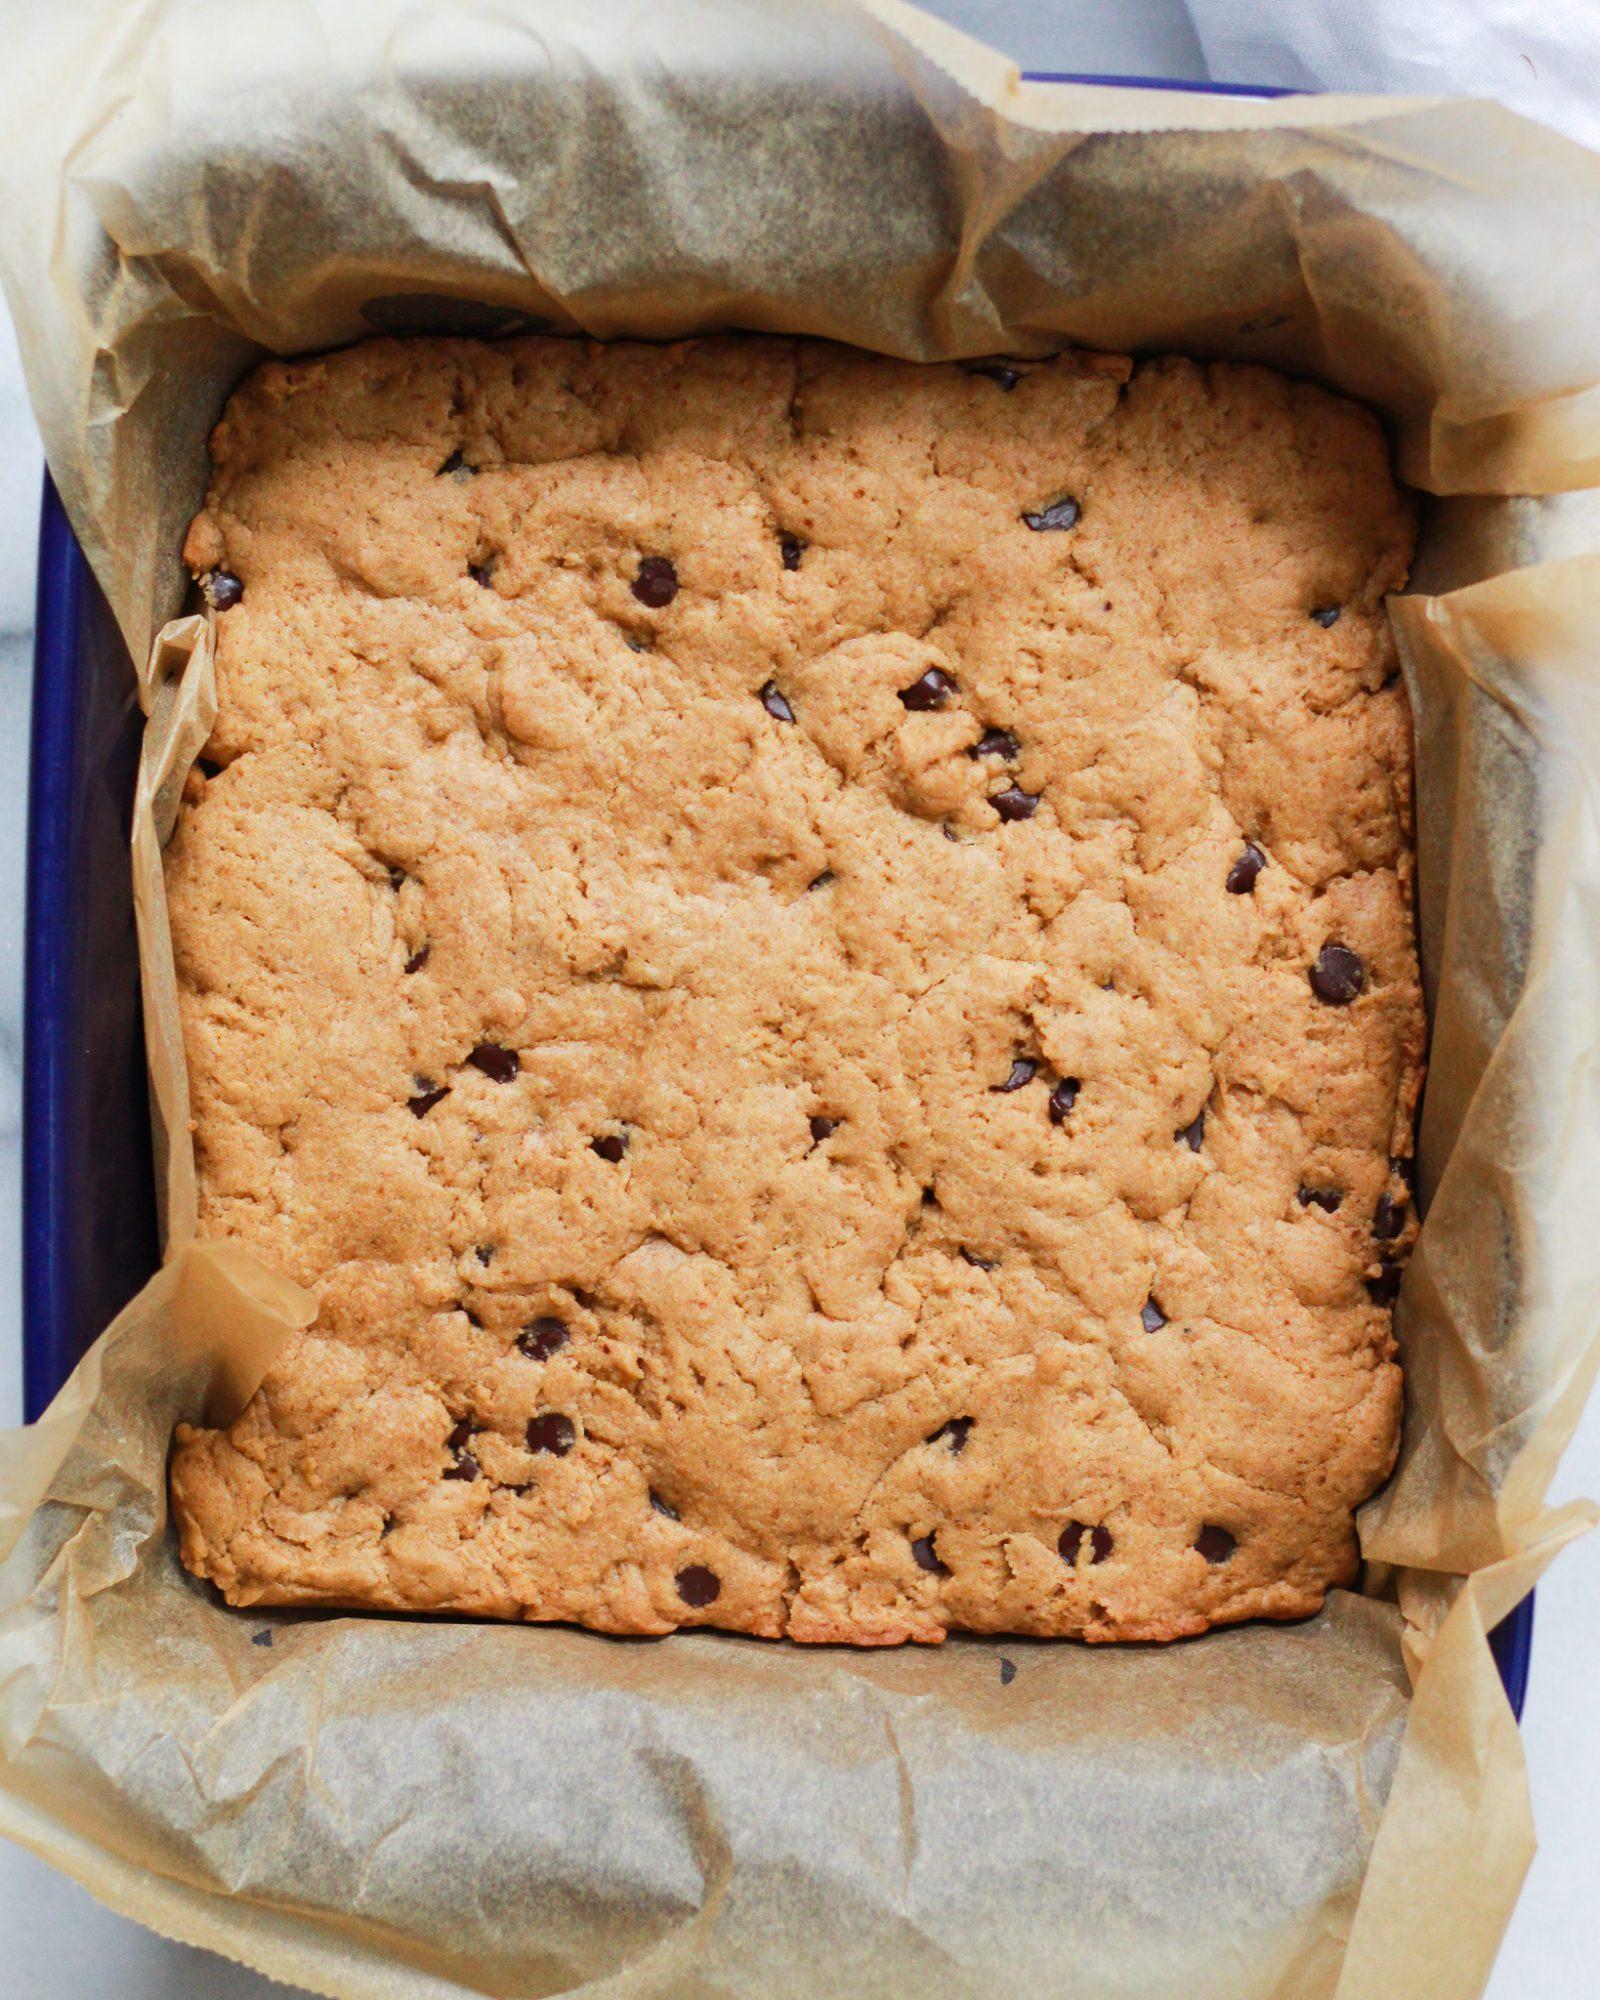 vegan cookie layer baked